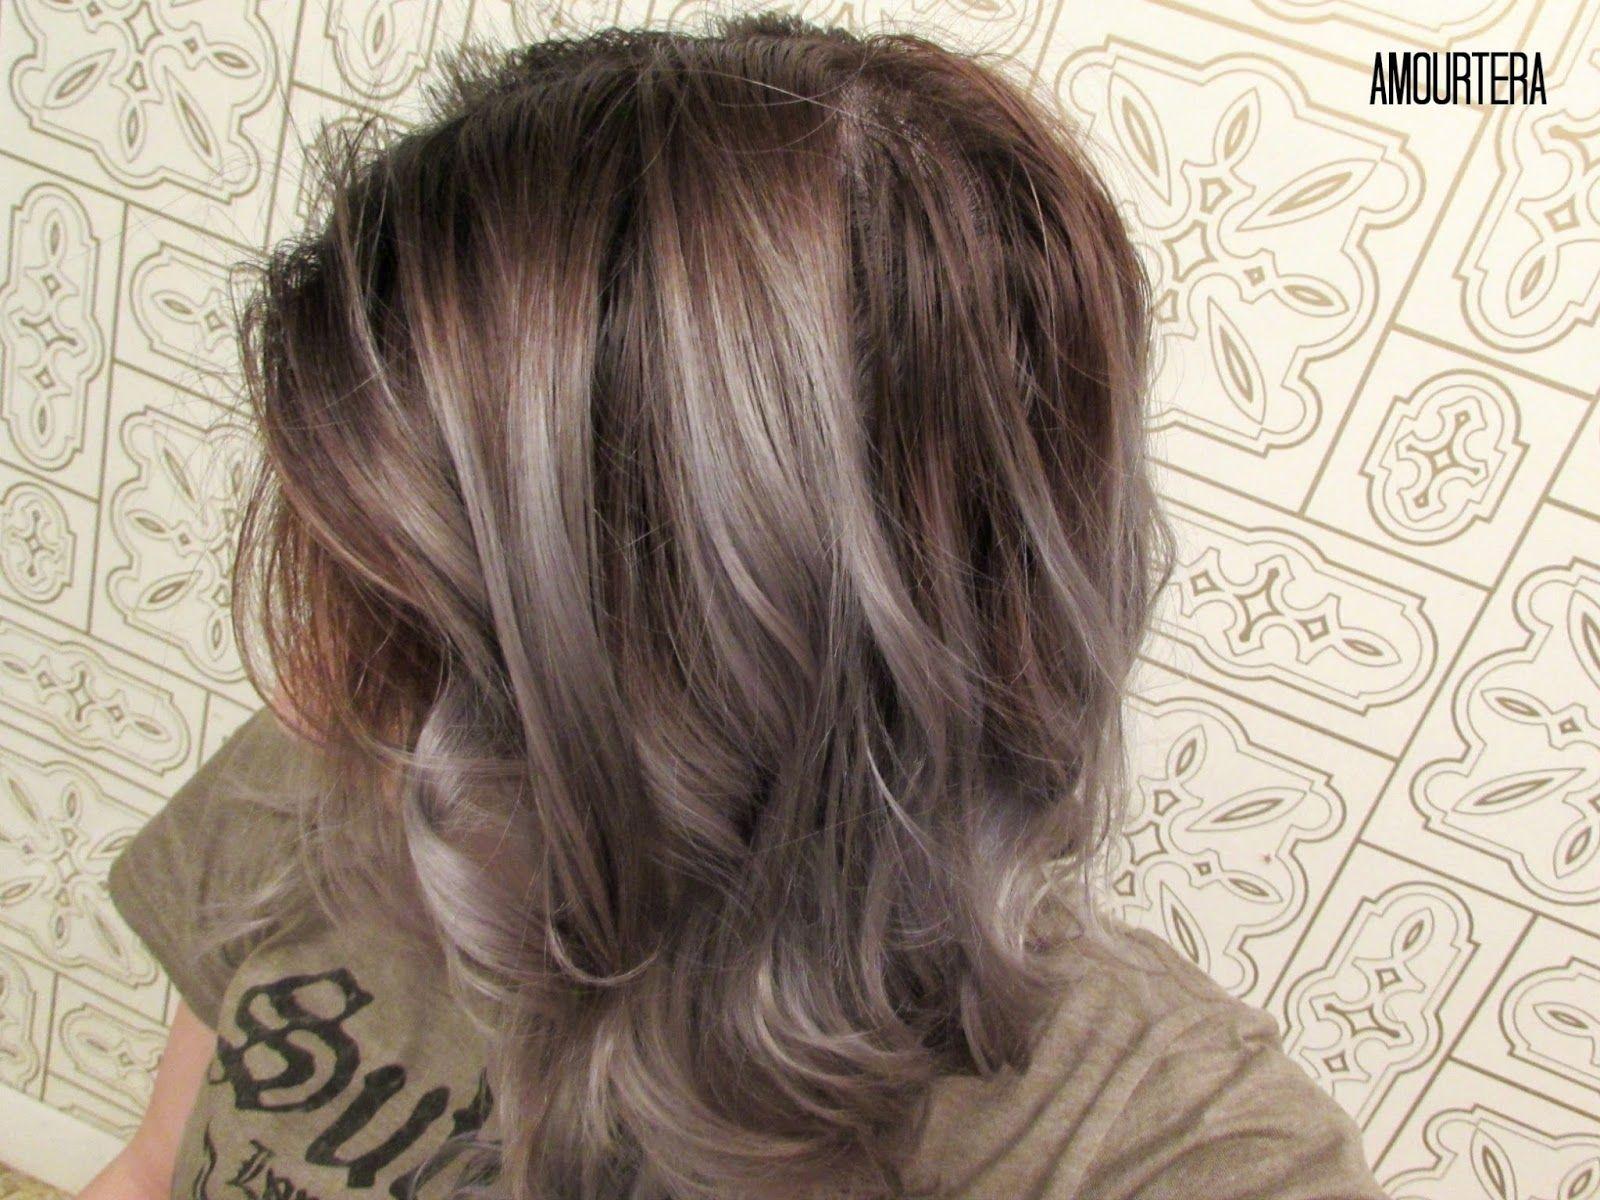 HOW TO GET SILVER/GRAY HAIR AT HOME | Silver grey hair, Gray hair ...